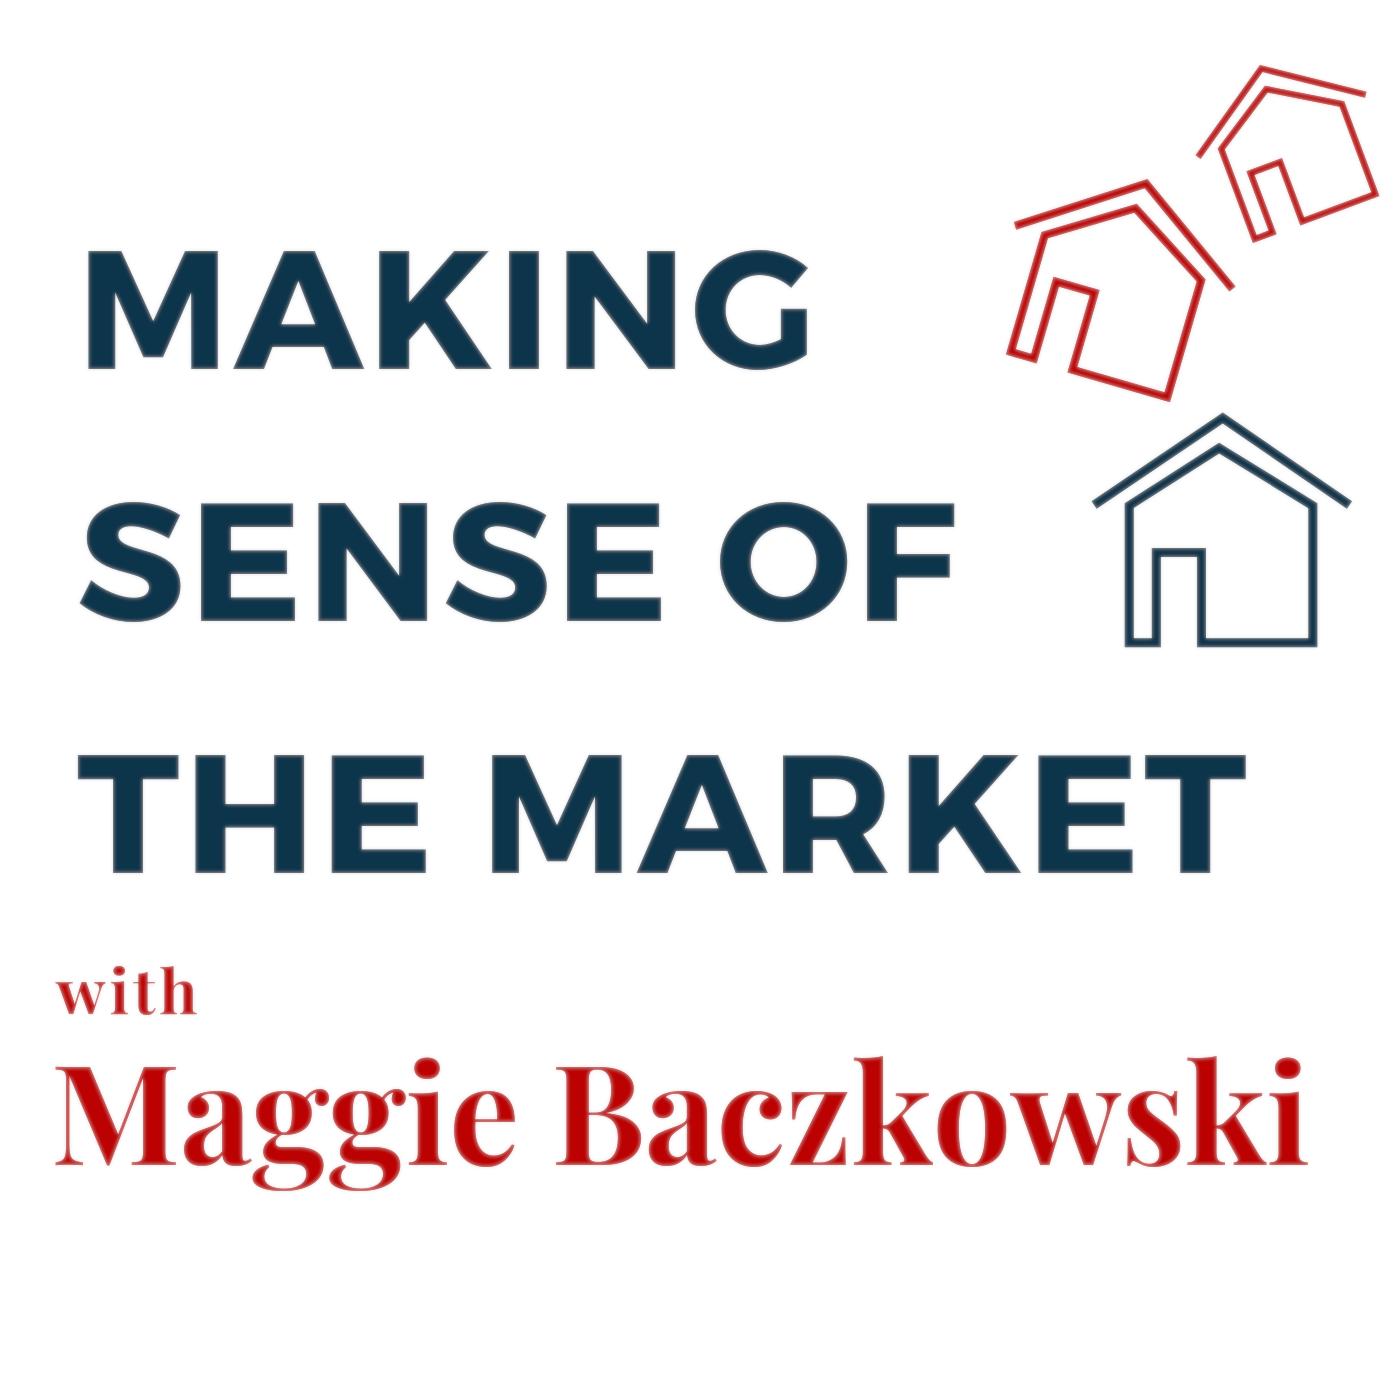 Making Sense of the Market with Maggie Baczkowski